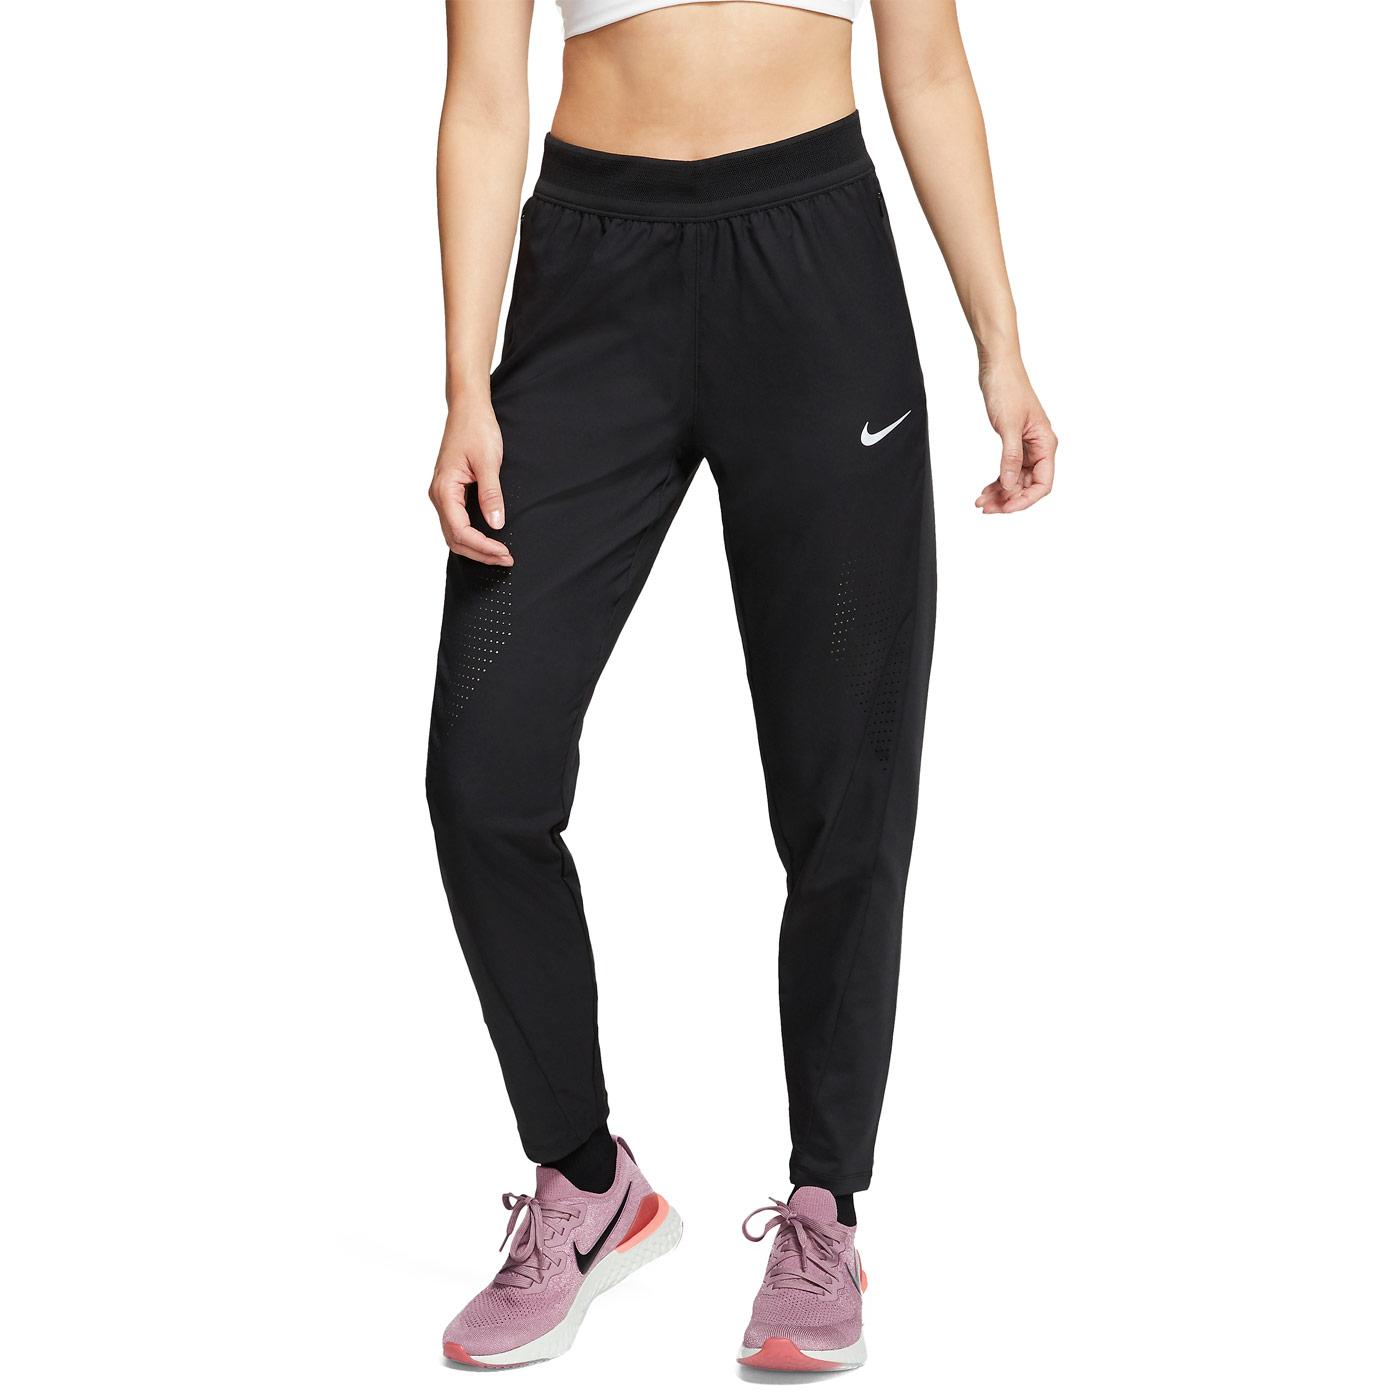 Nike Swift Pantaloni - Black/Reflective Silver